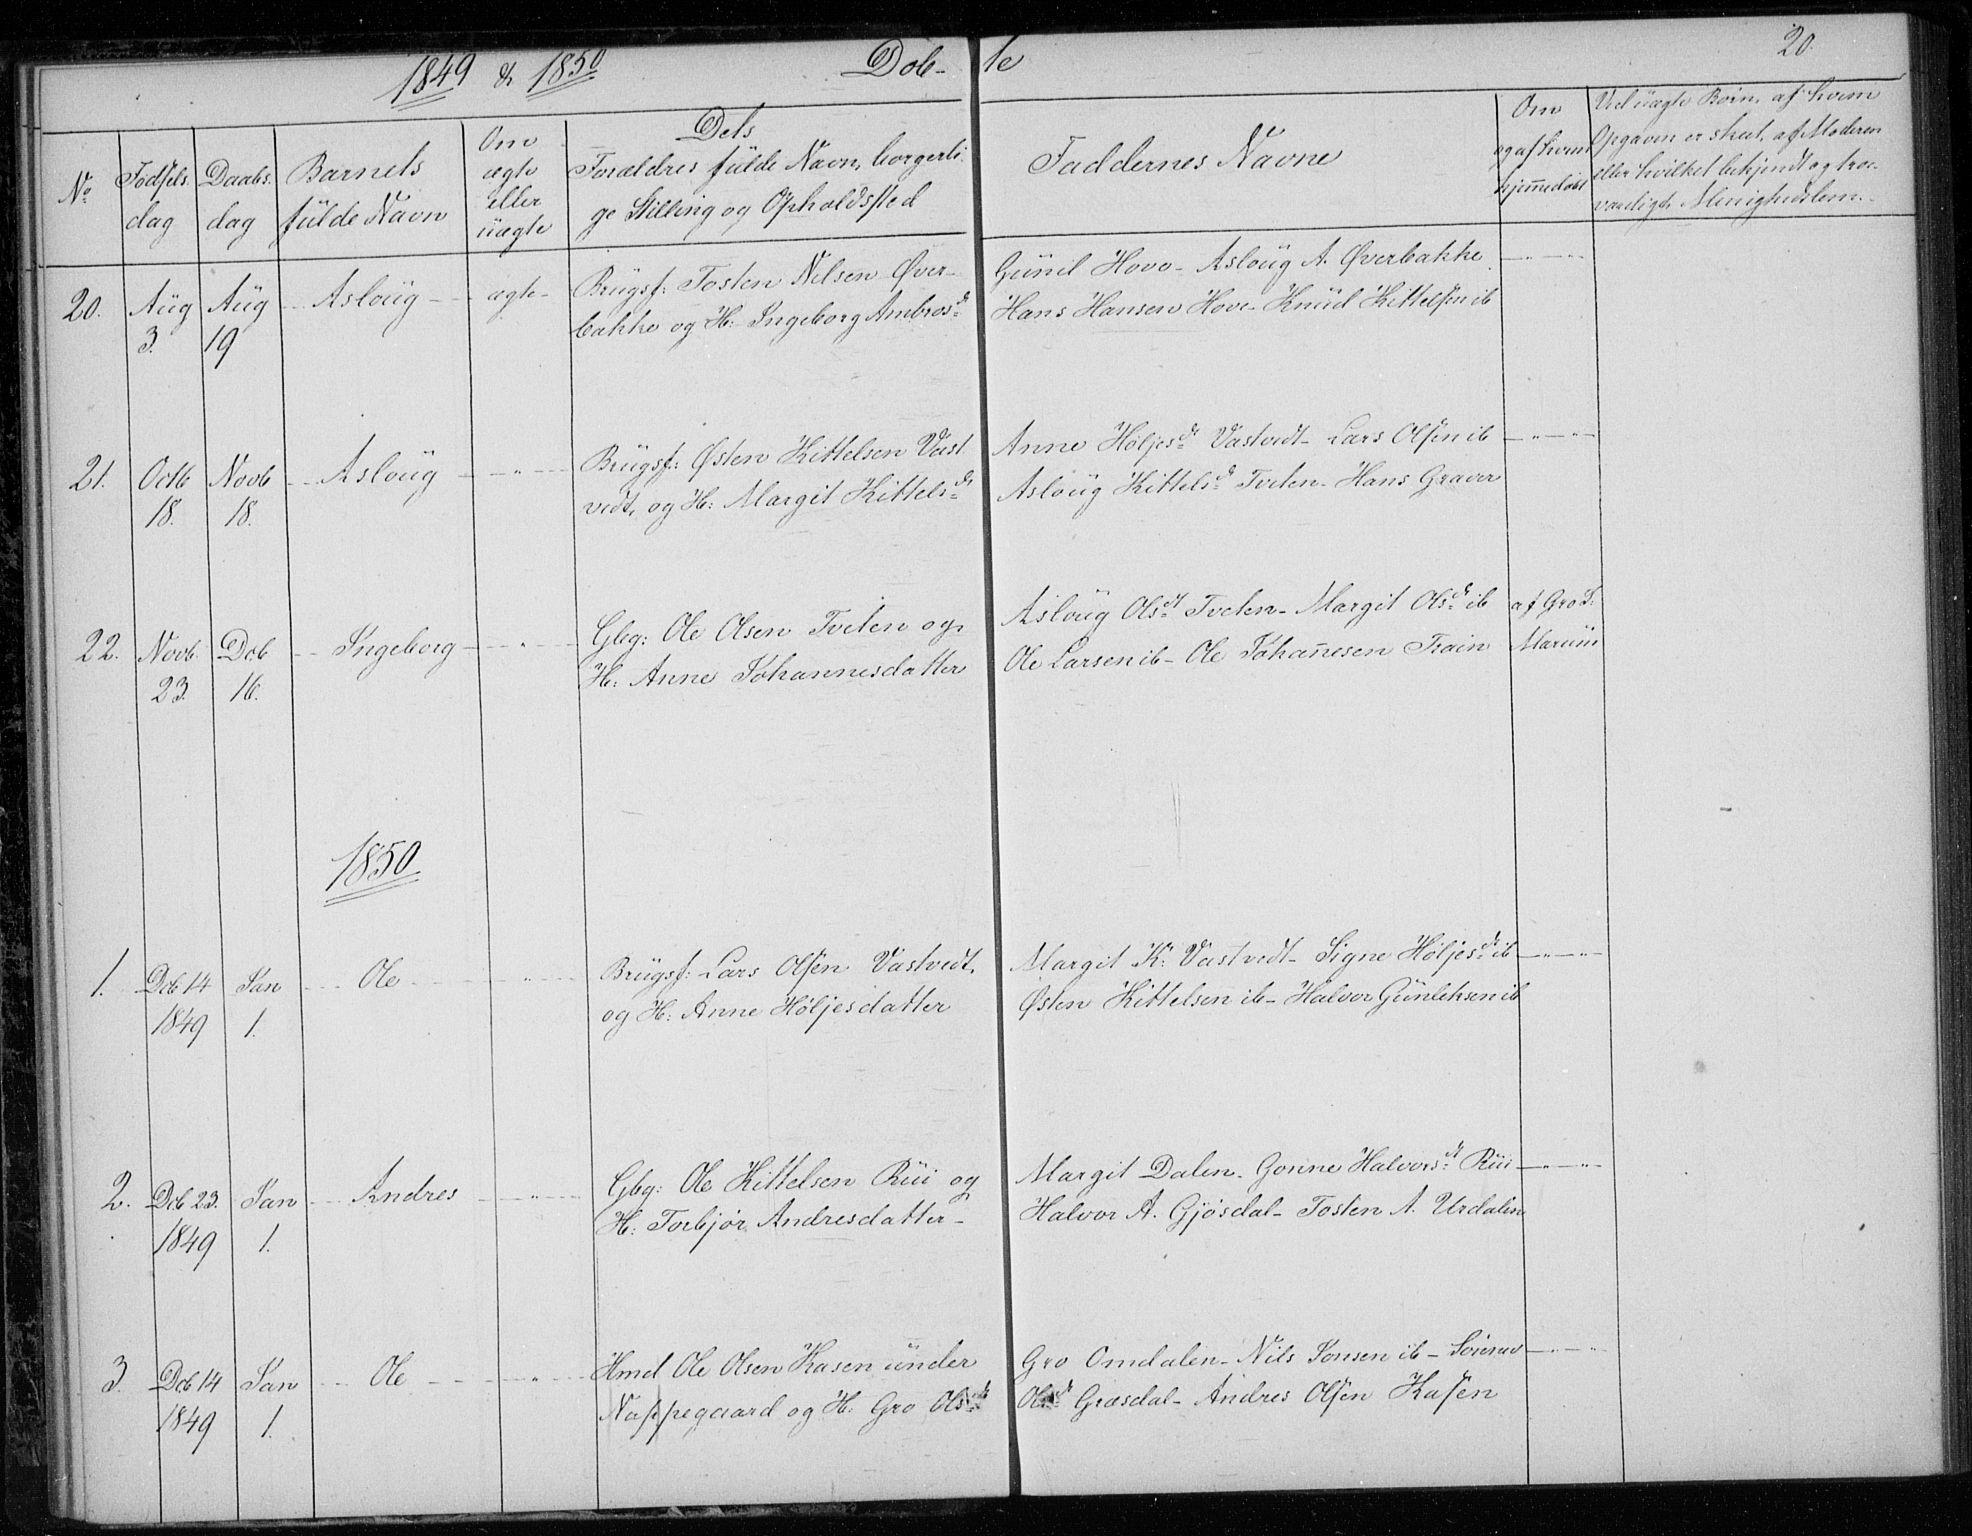 SAKO, Gransherad kirkebøker, F/Fb/L0003: Ministerialbok nr. II 3, 1844-1859, s. 20